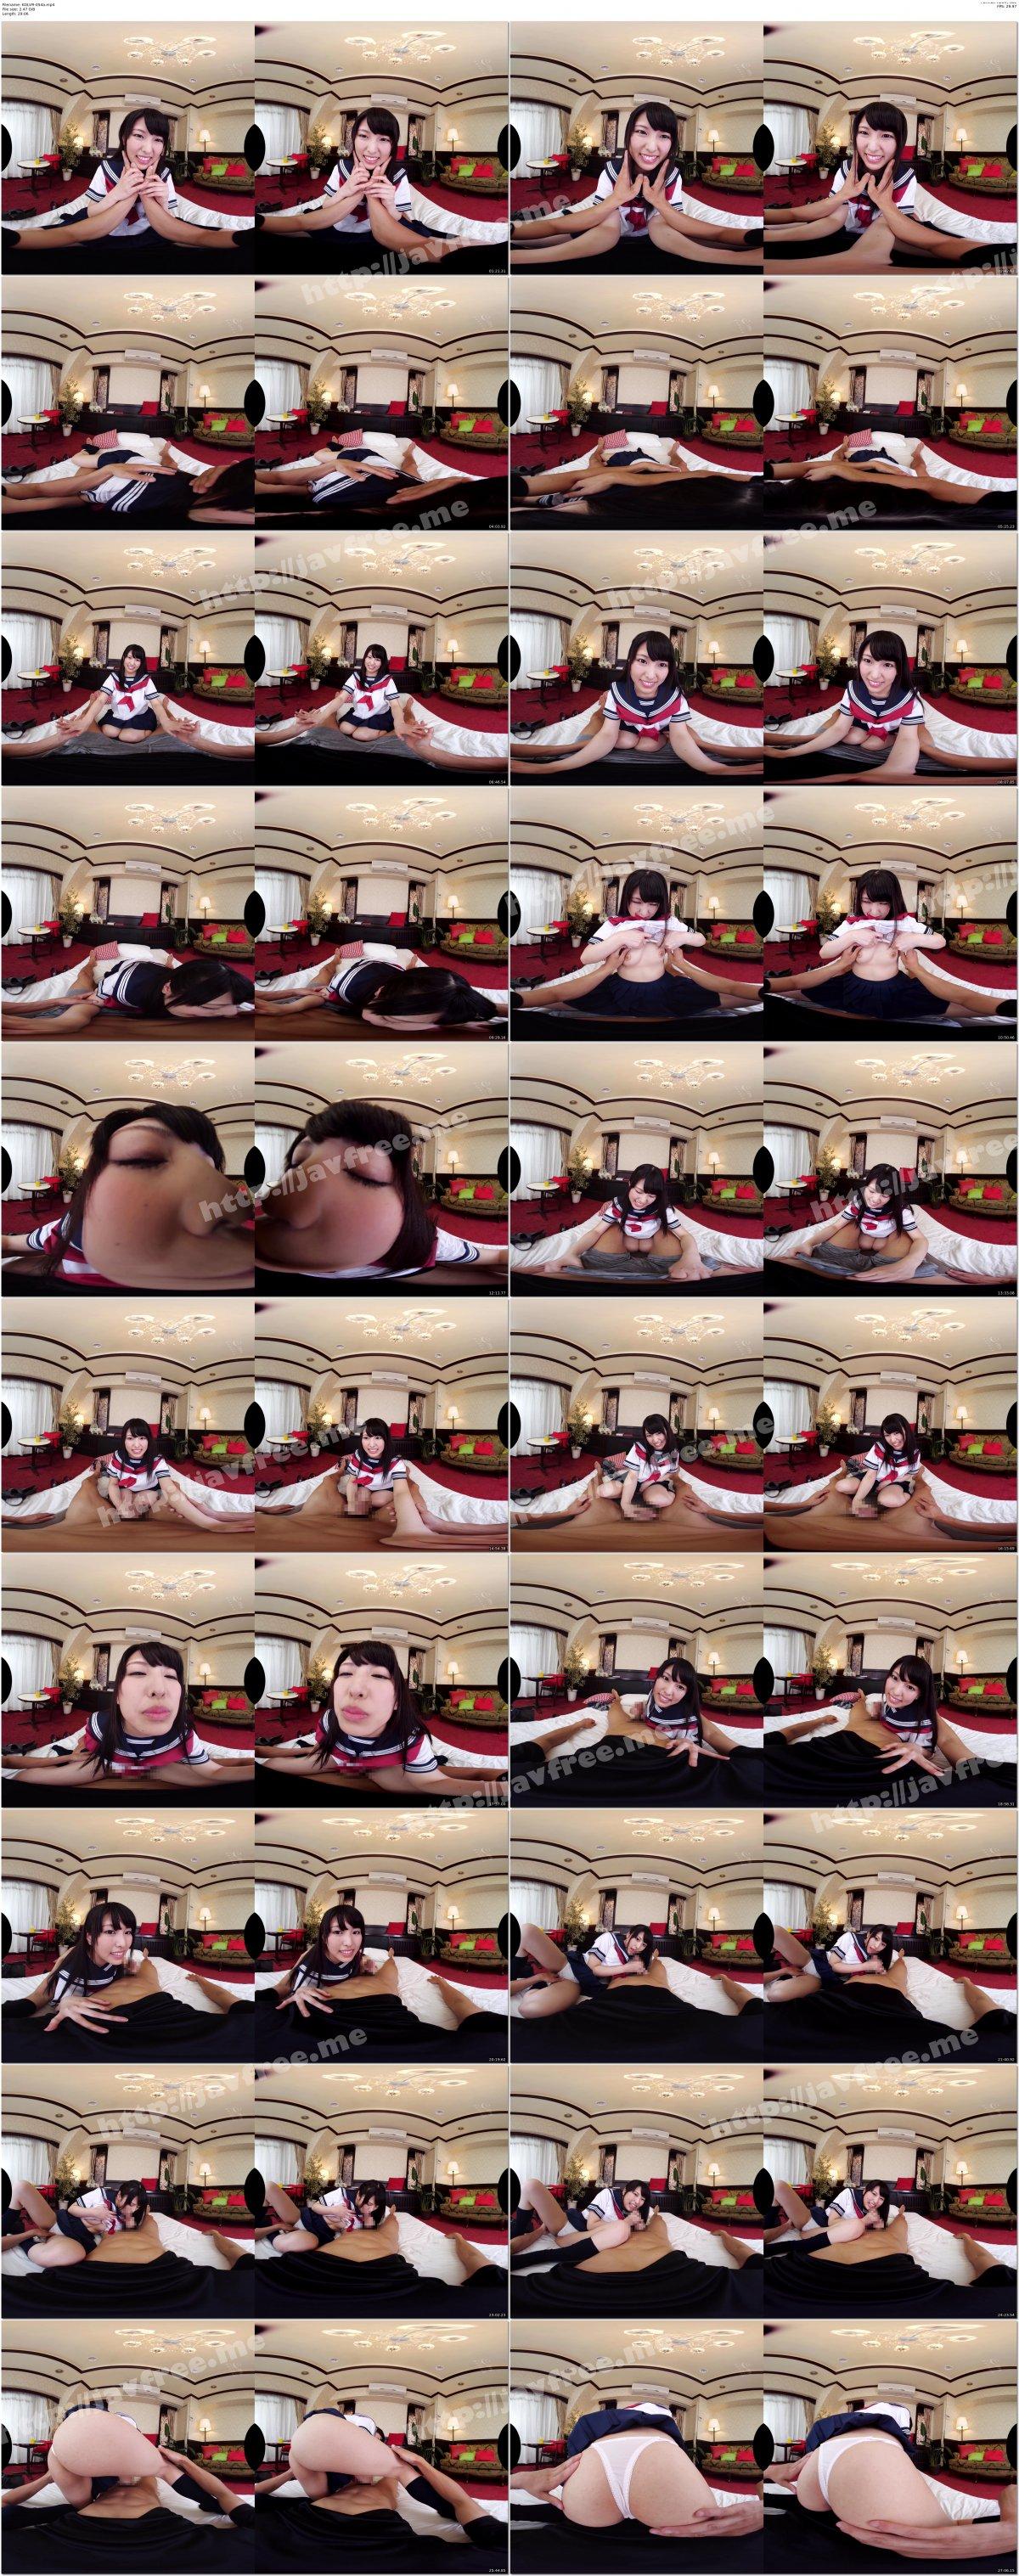 [KOLVR-054] 【VR】お気に入り嬢は『倉木しおり』 内緒で本番!J○制服リフレ - image KOLVR-054a on https://javfree.me